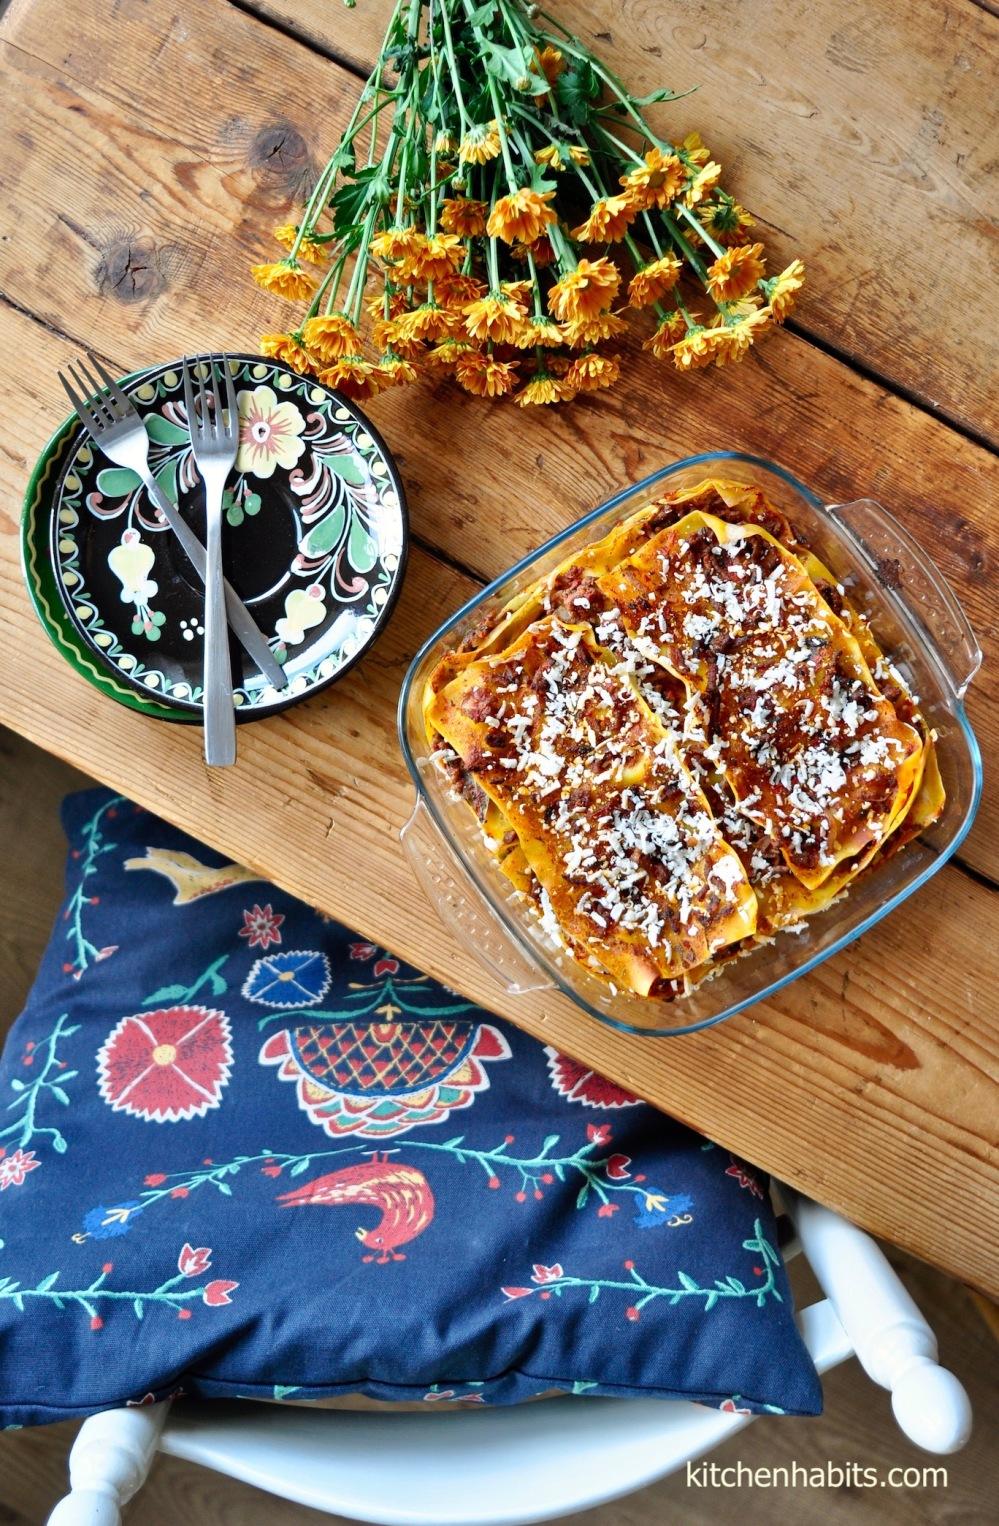 lazania_kitchenhabitscom1